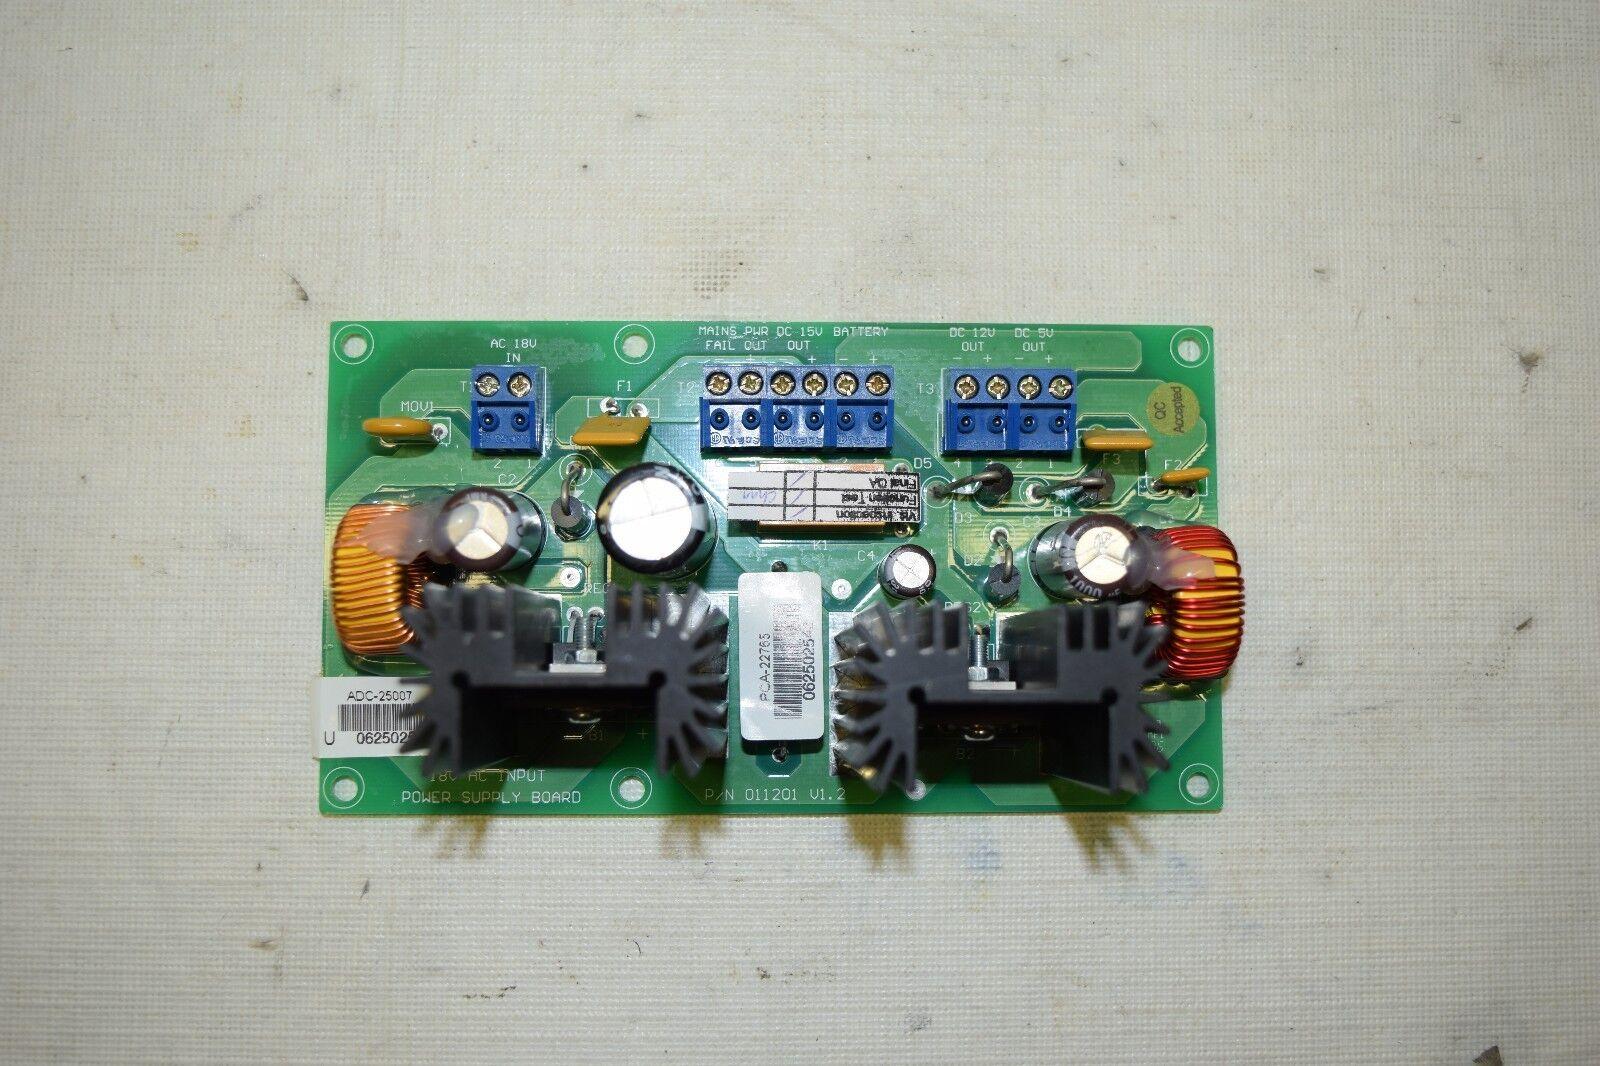 Bosch Access Easy Controller Power Supply Board ADC-25007 P/N 011201 Door Contro